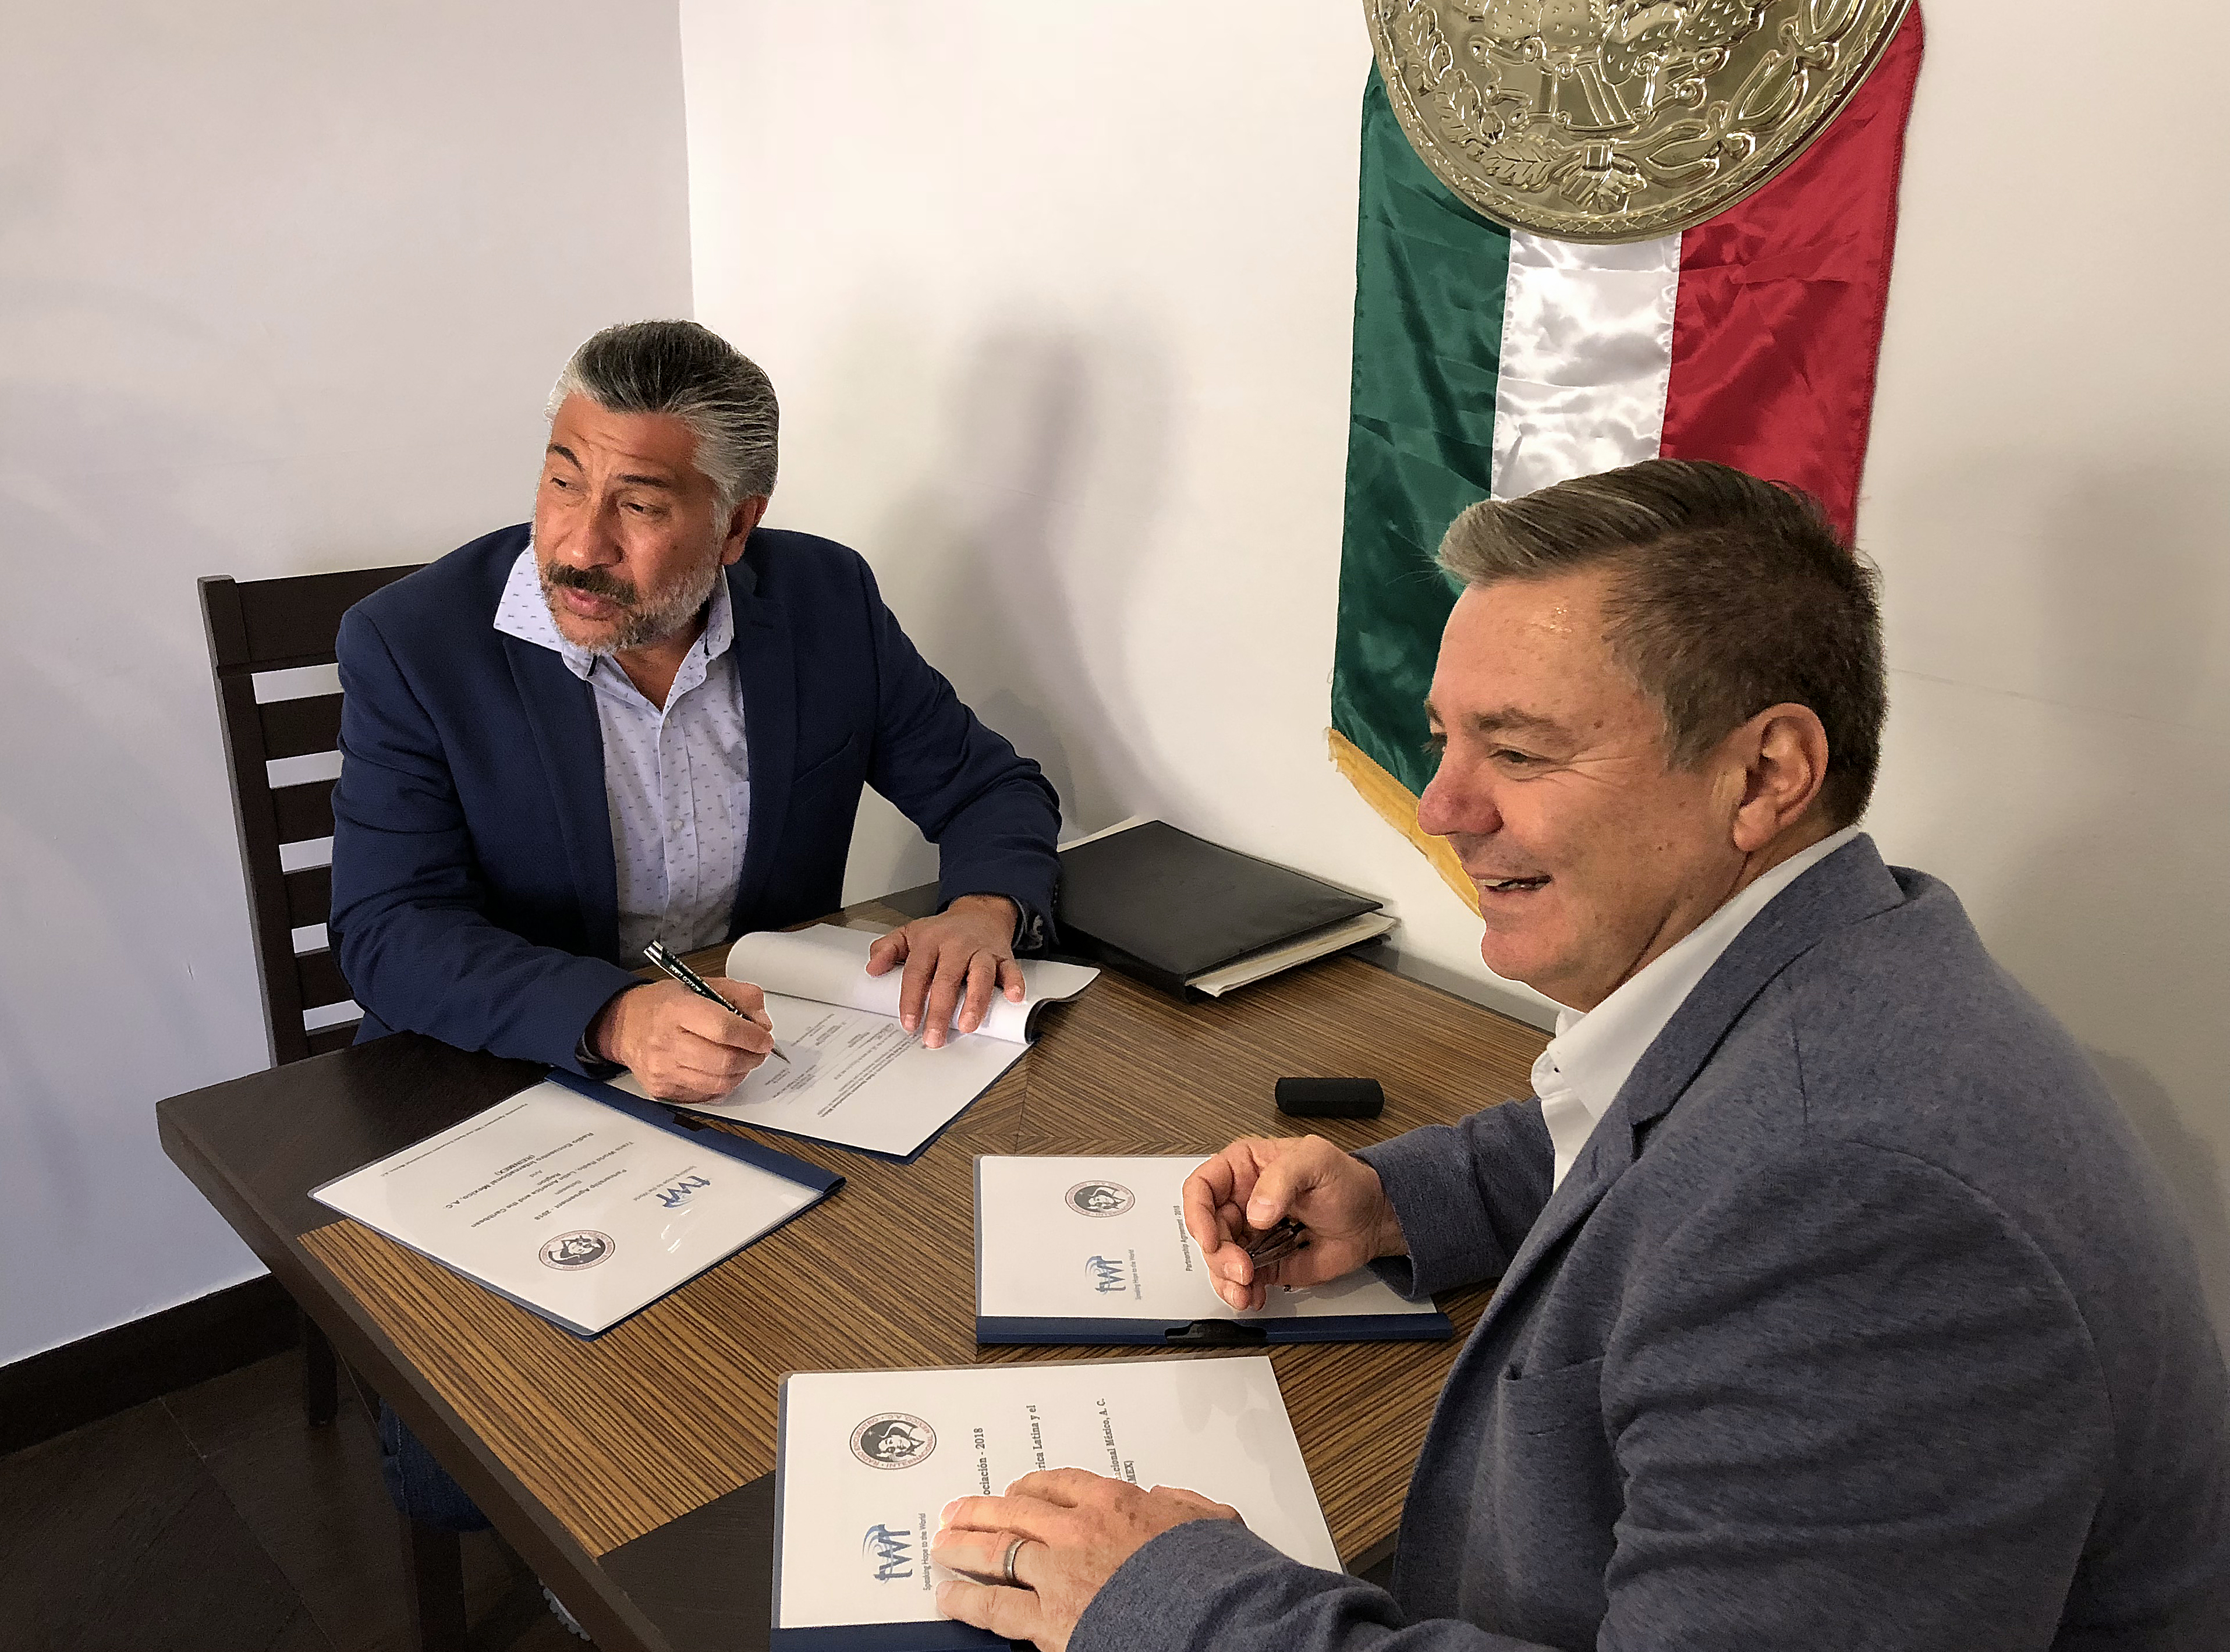 New radio partnership to open doors in Mexico